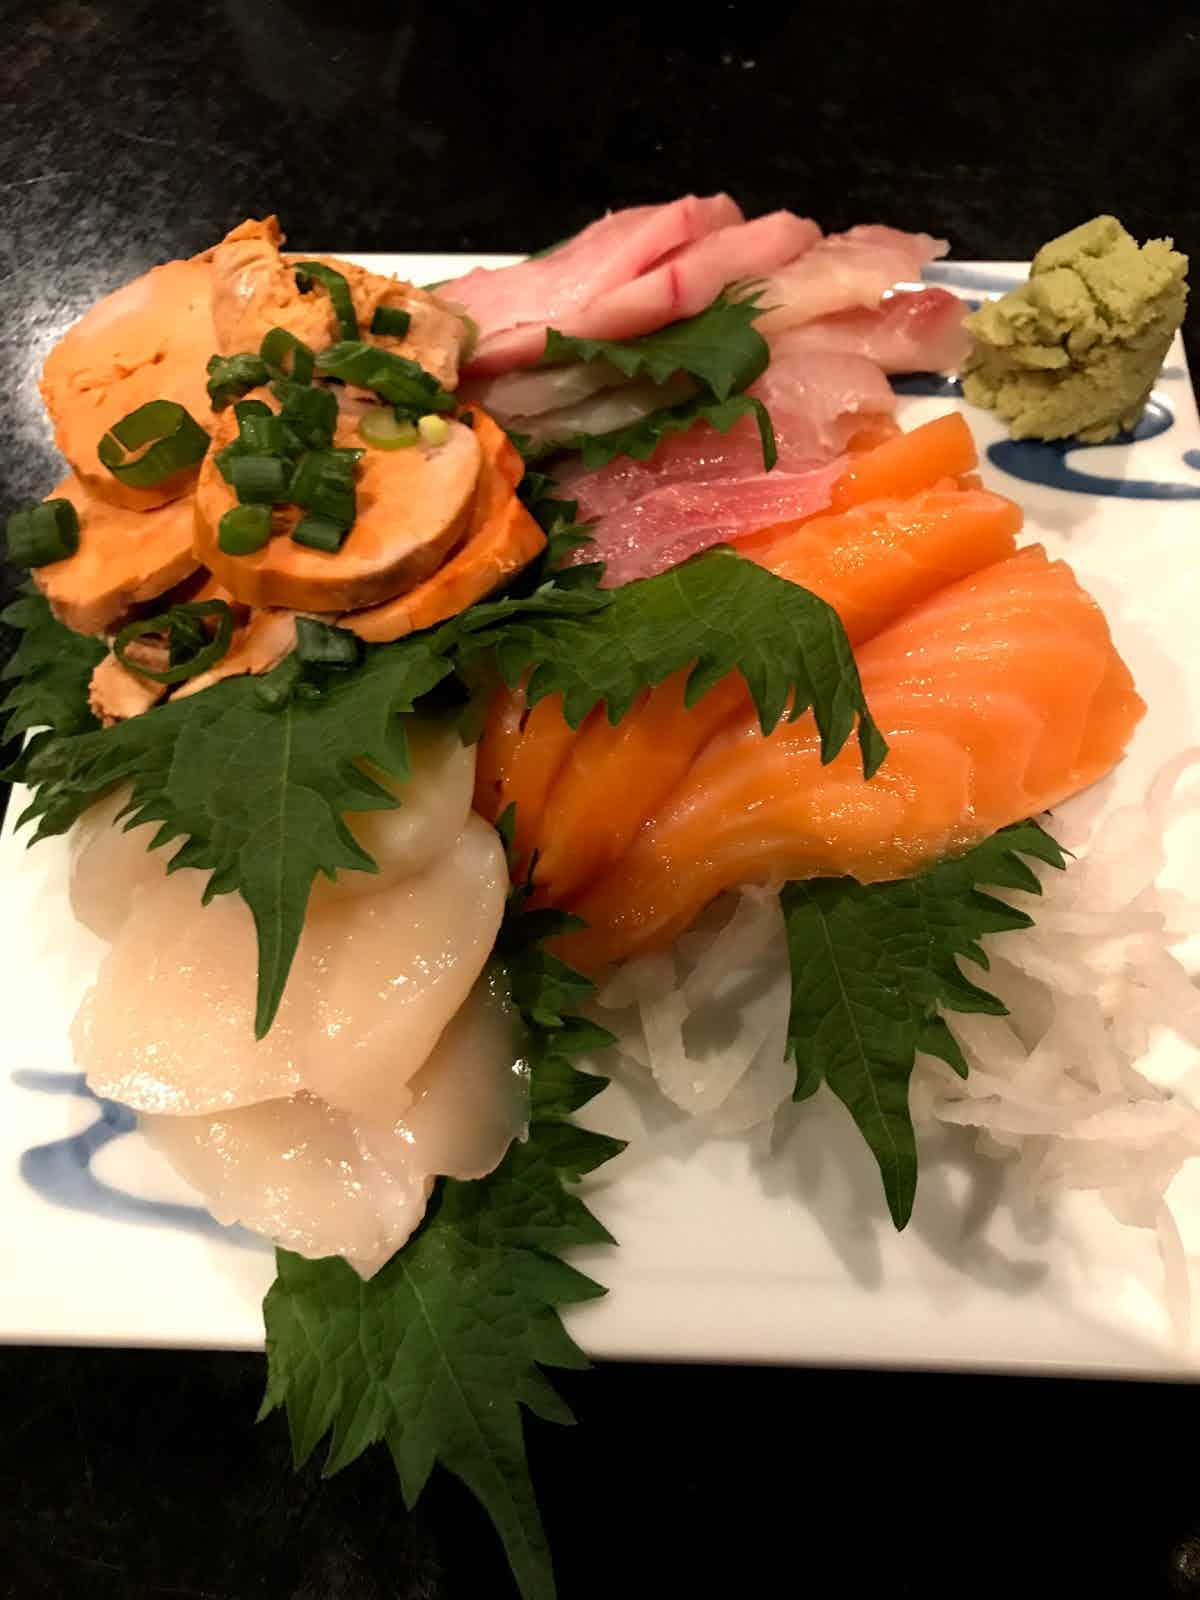 Origami Japanese Cuisine & Sushi Bar - Home - Corpus Christi ... | 1600x1200